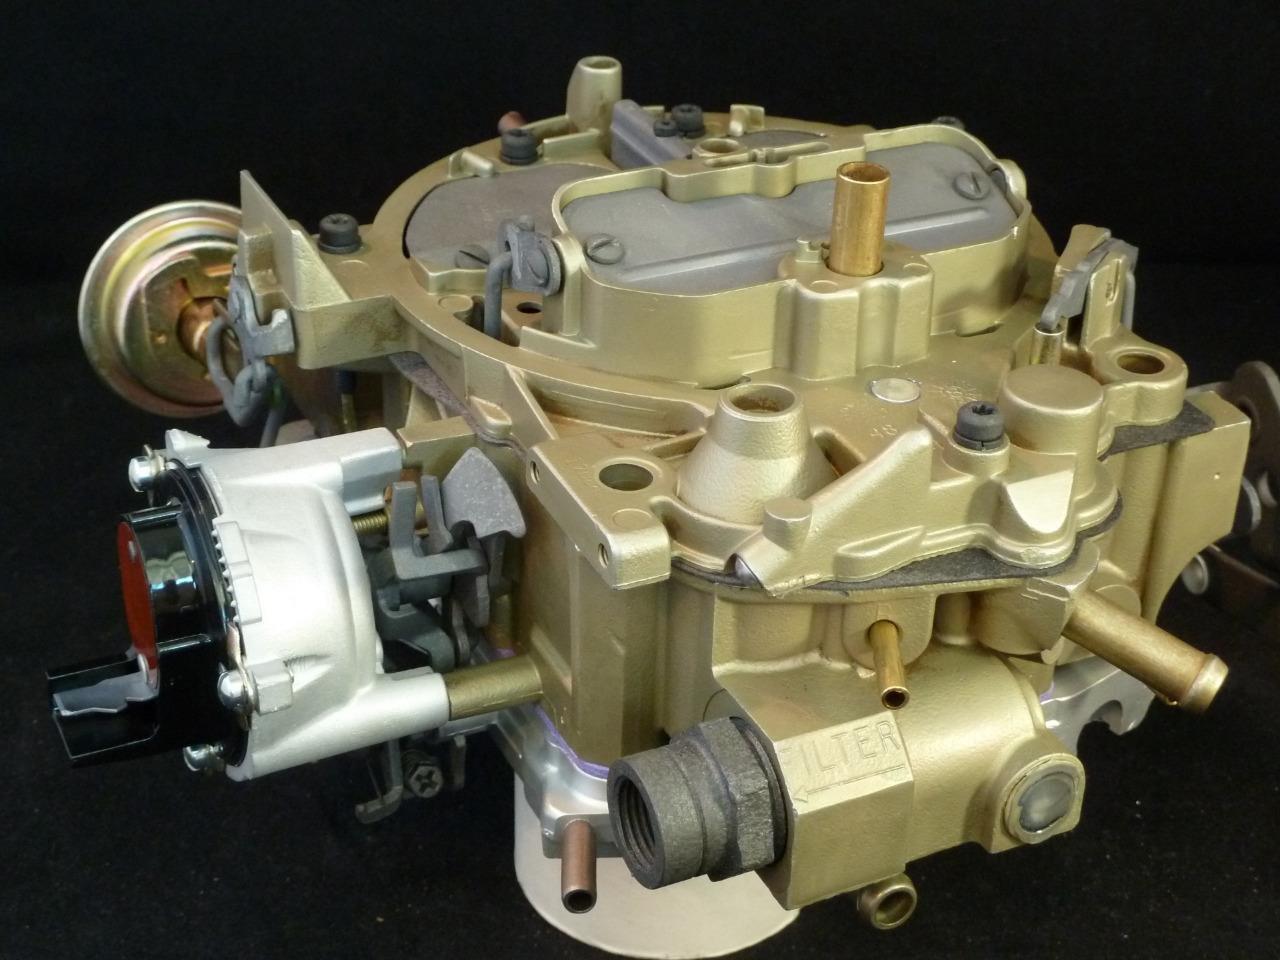 Gy6 150cc Buggy Wiring Diagram Expert Schematics Regulator Twister Hammerhead Library Of Diagrams U2022 Yamaha Zuma 50